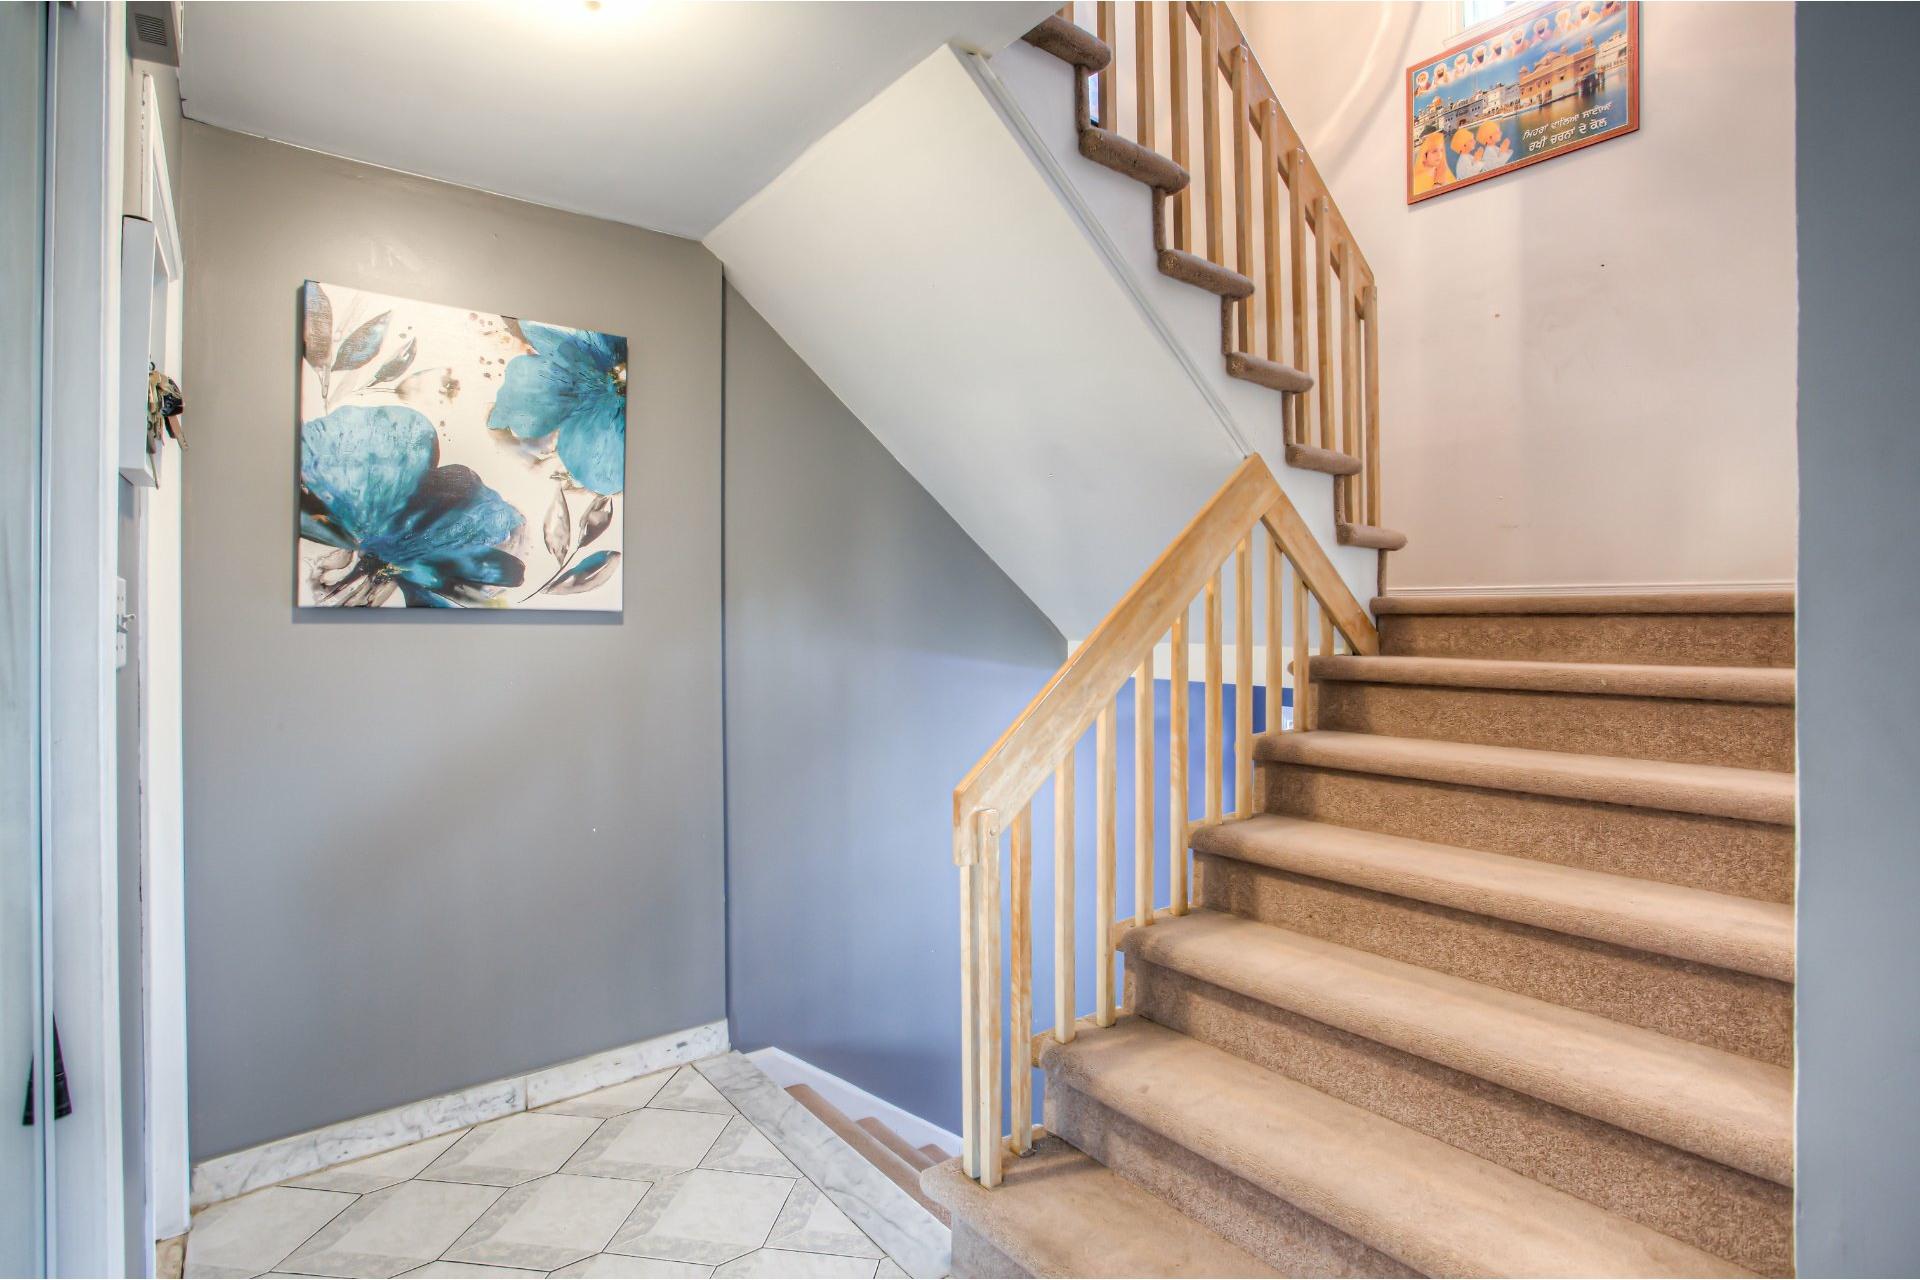 image 4 - House For sale Pierrefonds-Roxboro Montréal  - 8 rooms